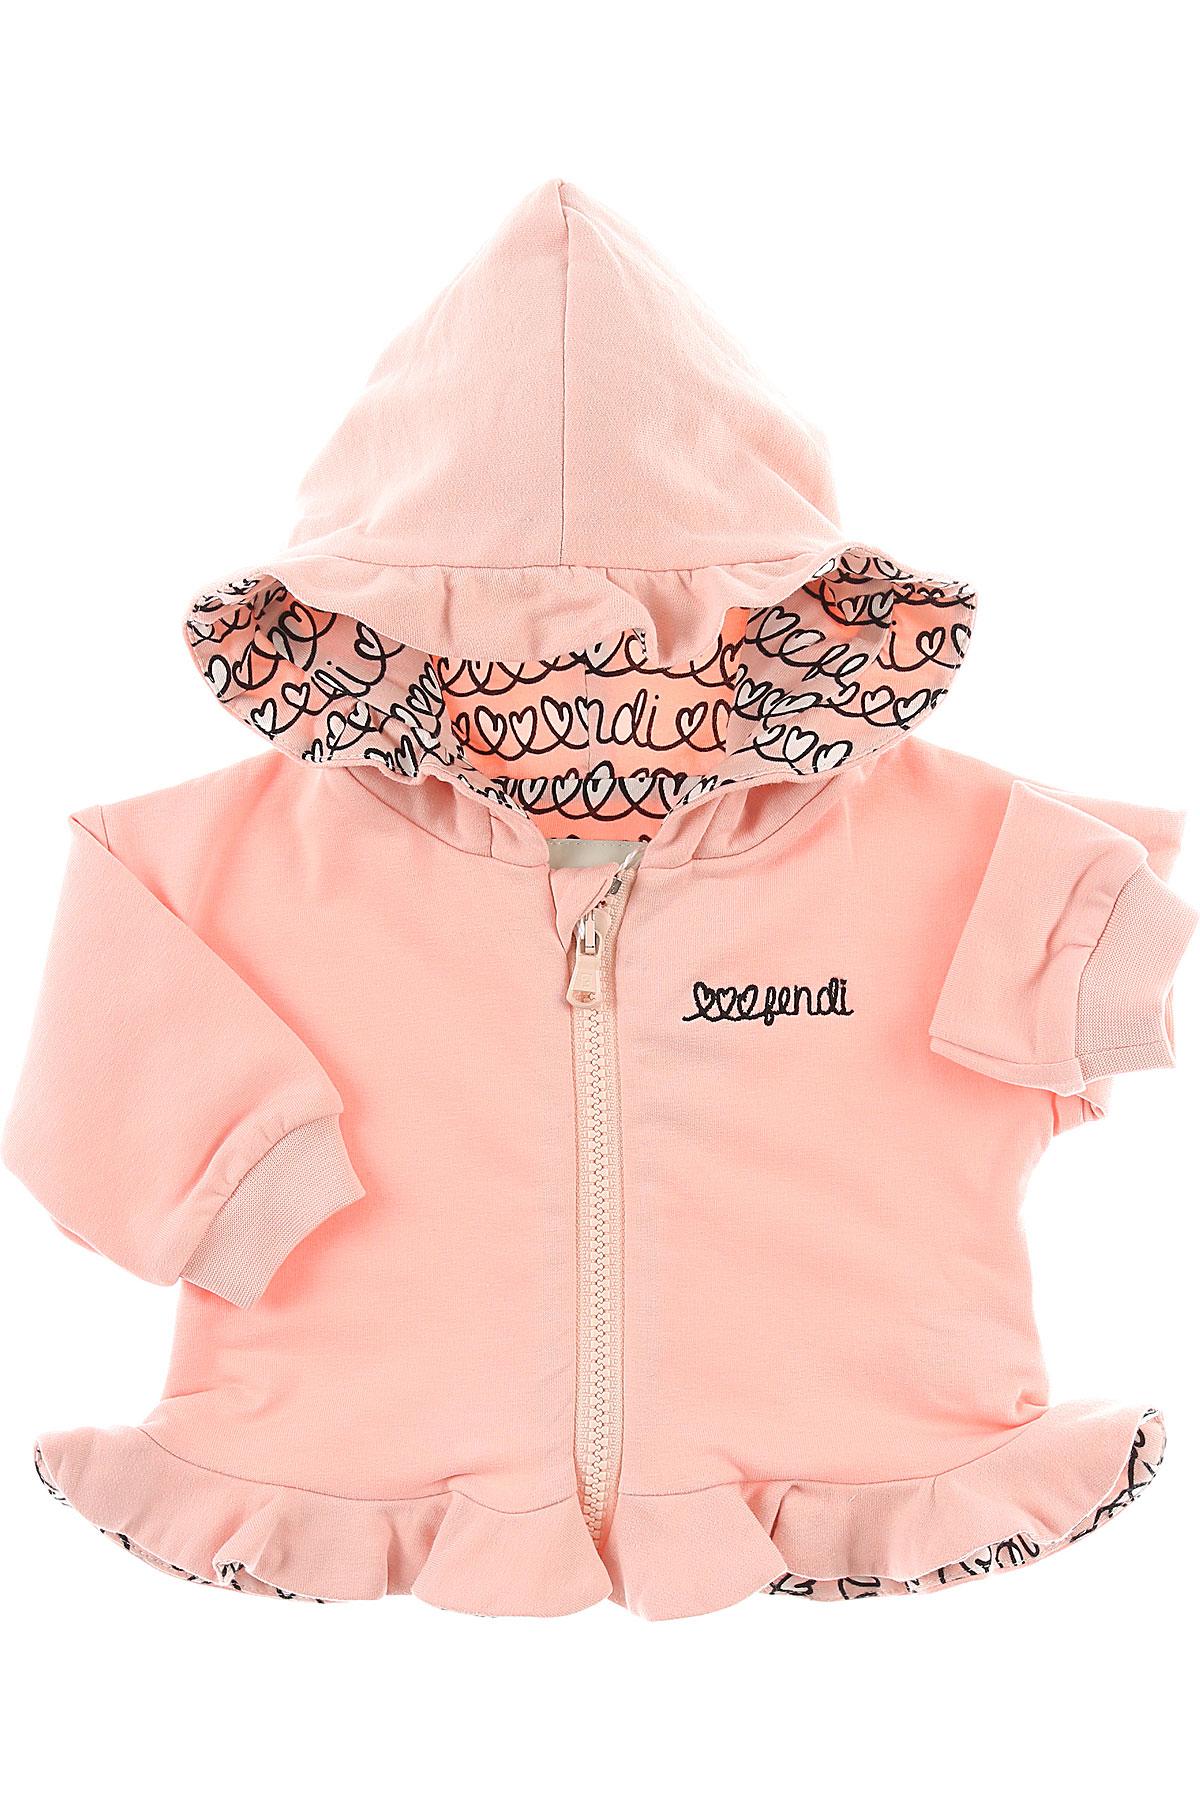 Image of Fendi Baby Sweatshirts & Hoodies for Girls, Pink, Cotton, 2017, 18M 3M 6M 9M